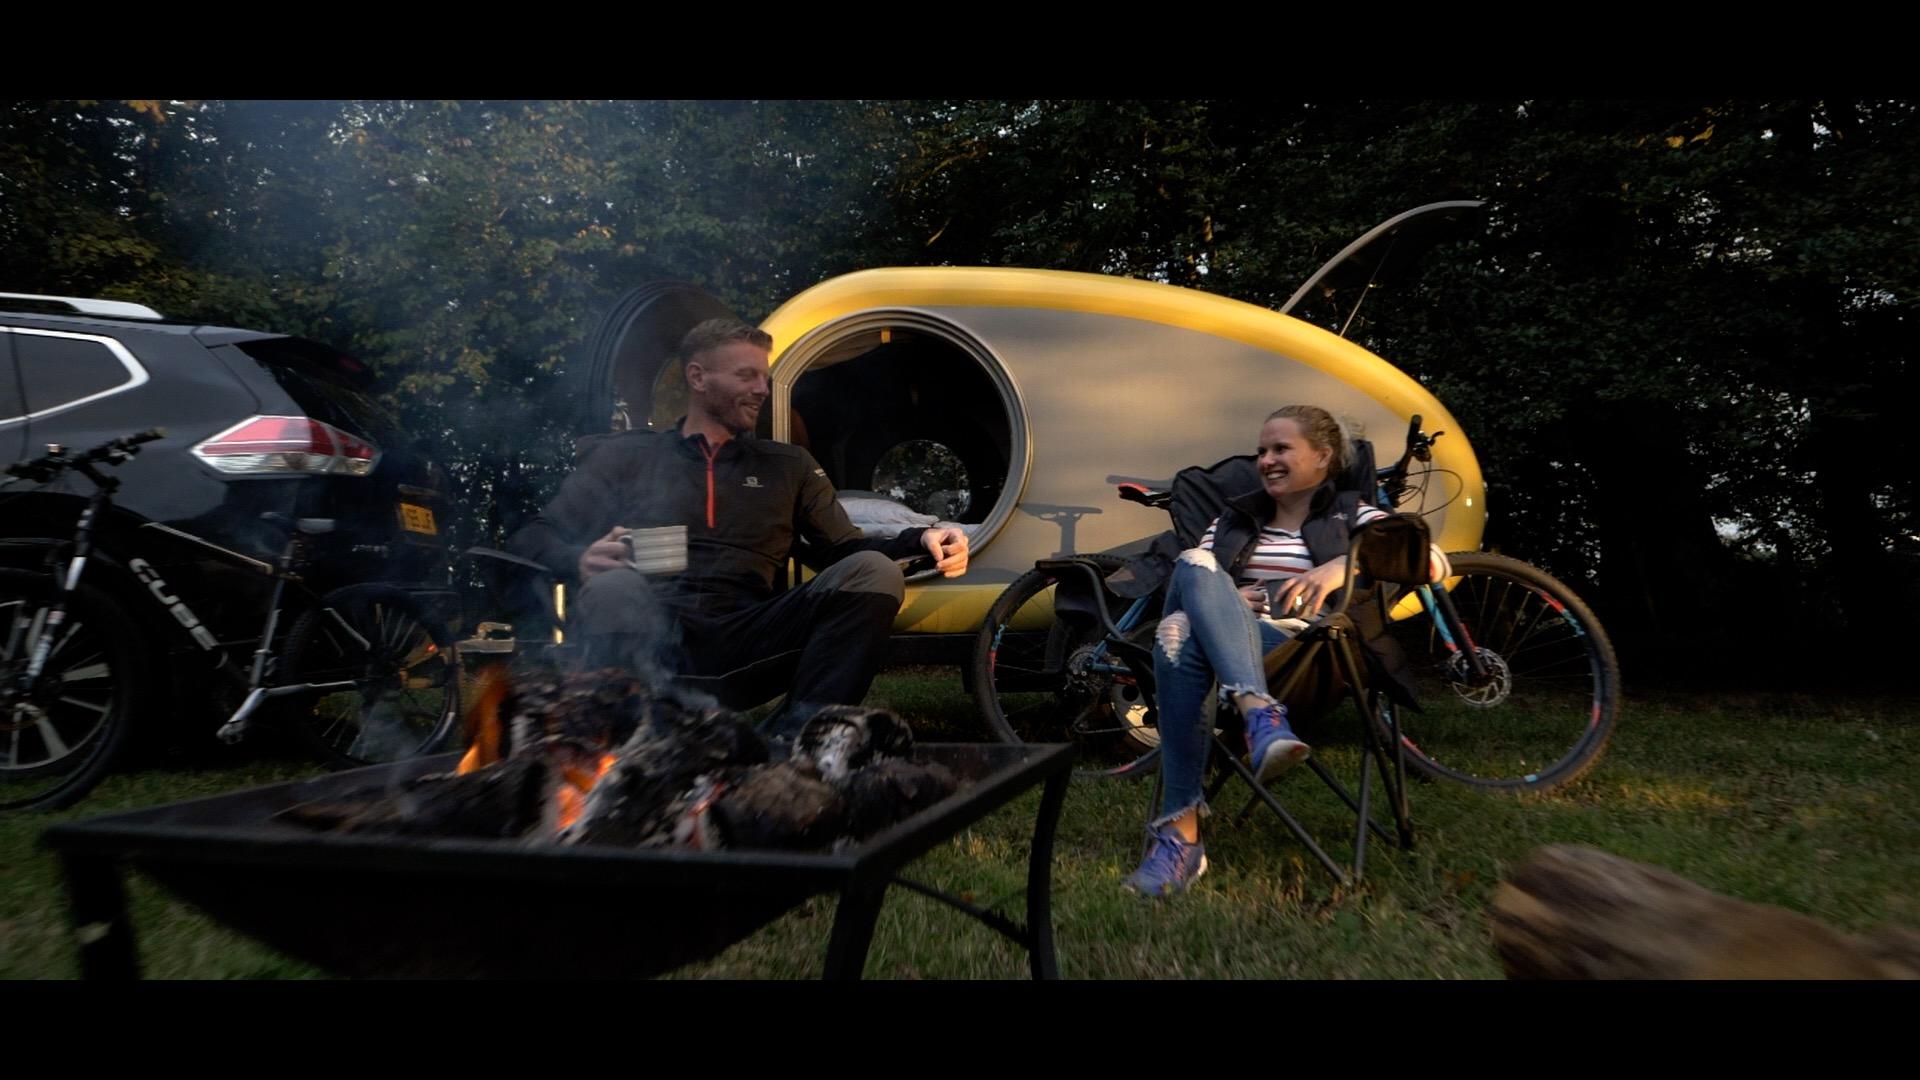 Mink Campers Scotland Campfire.jpg